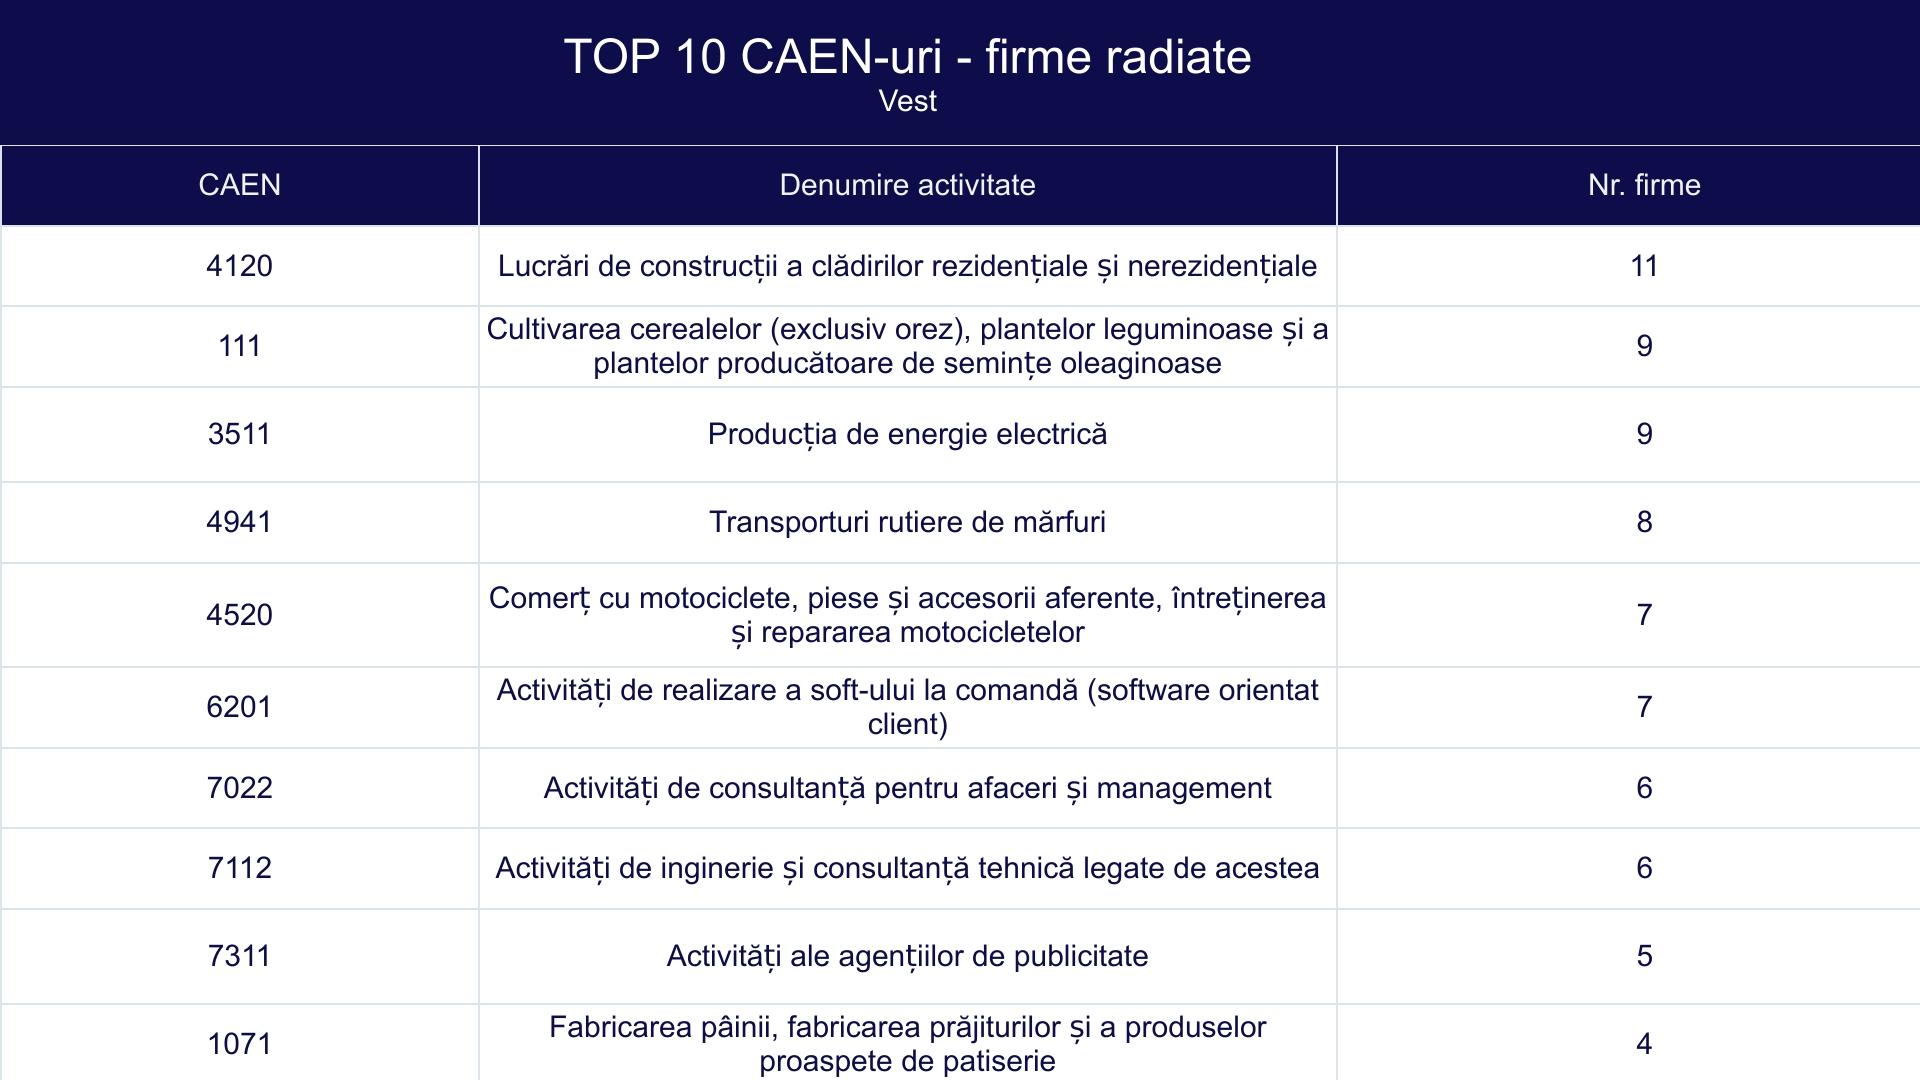 TOP 10 CAEN-uri - firme radiate - Vest